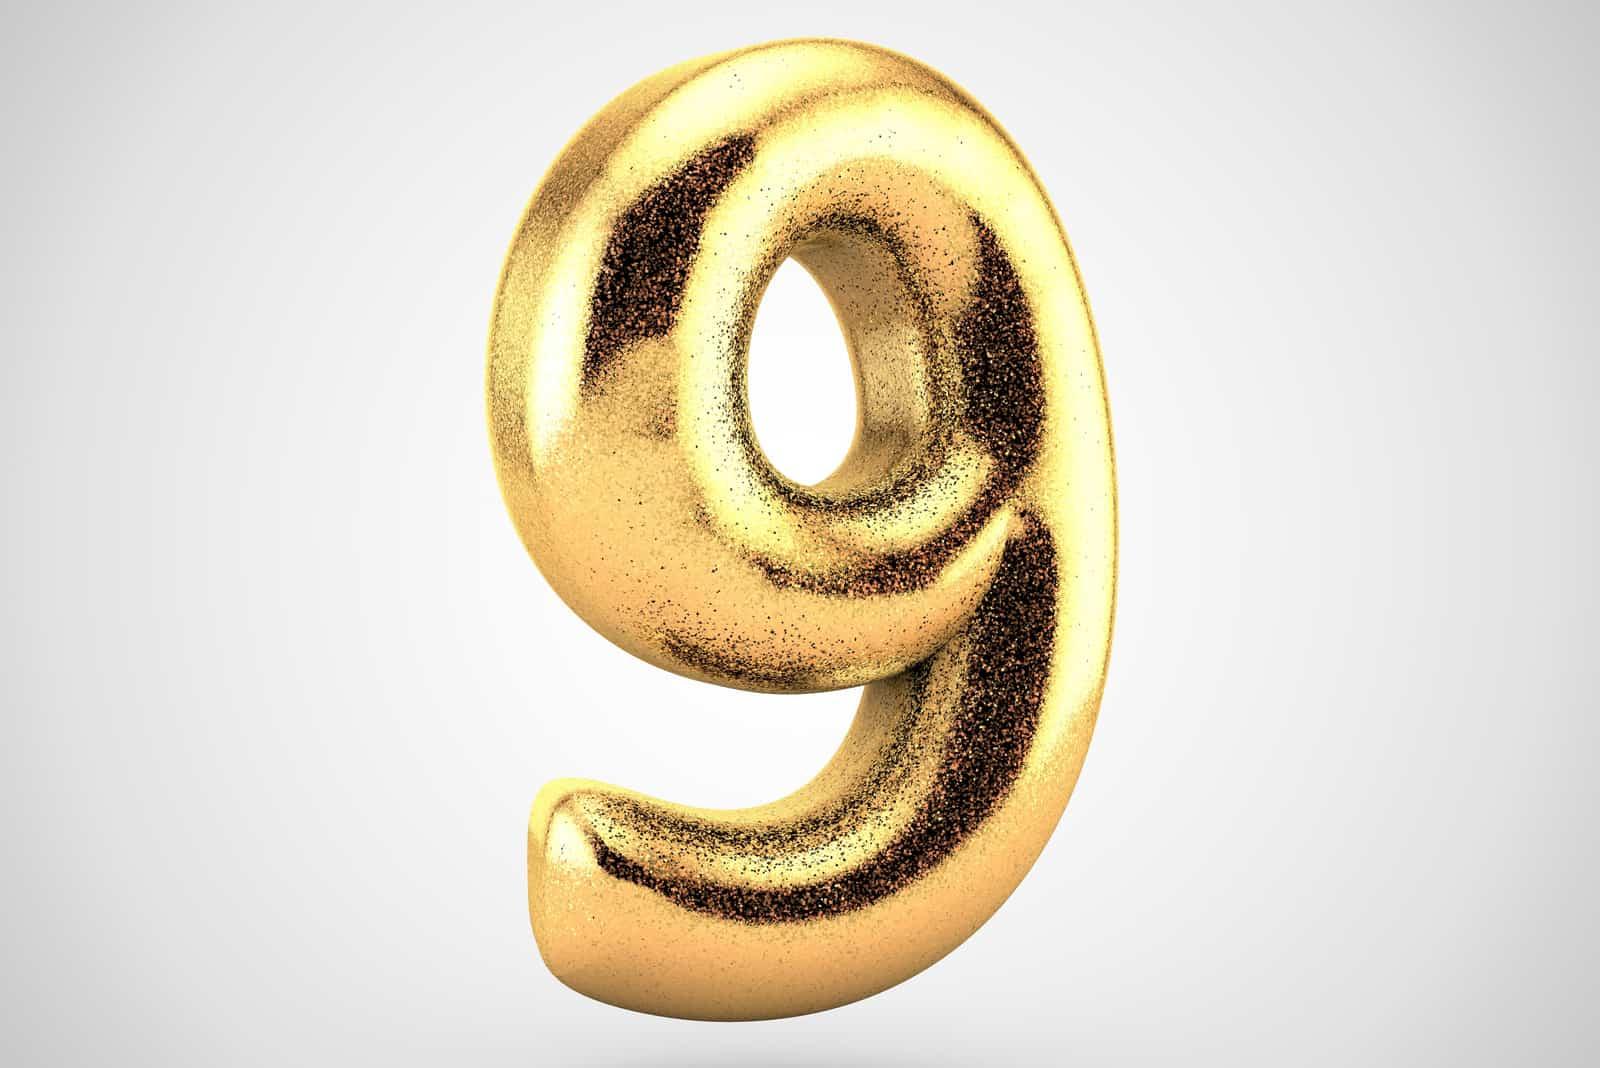 Nummer 9 der Goldfarbe